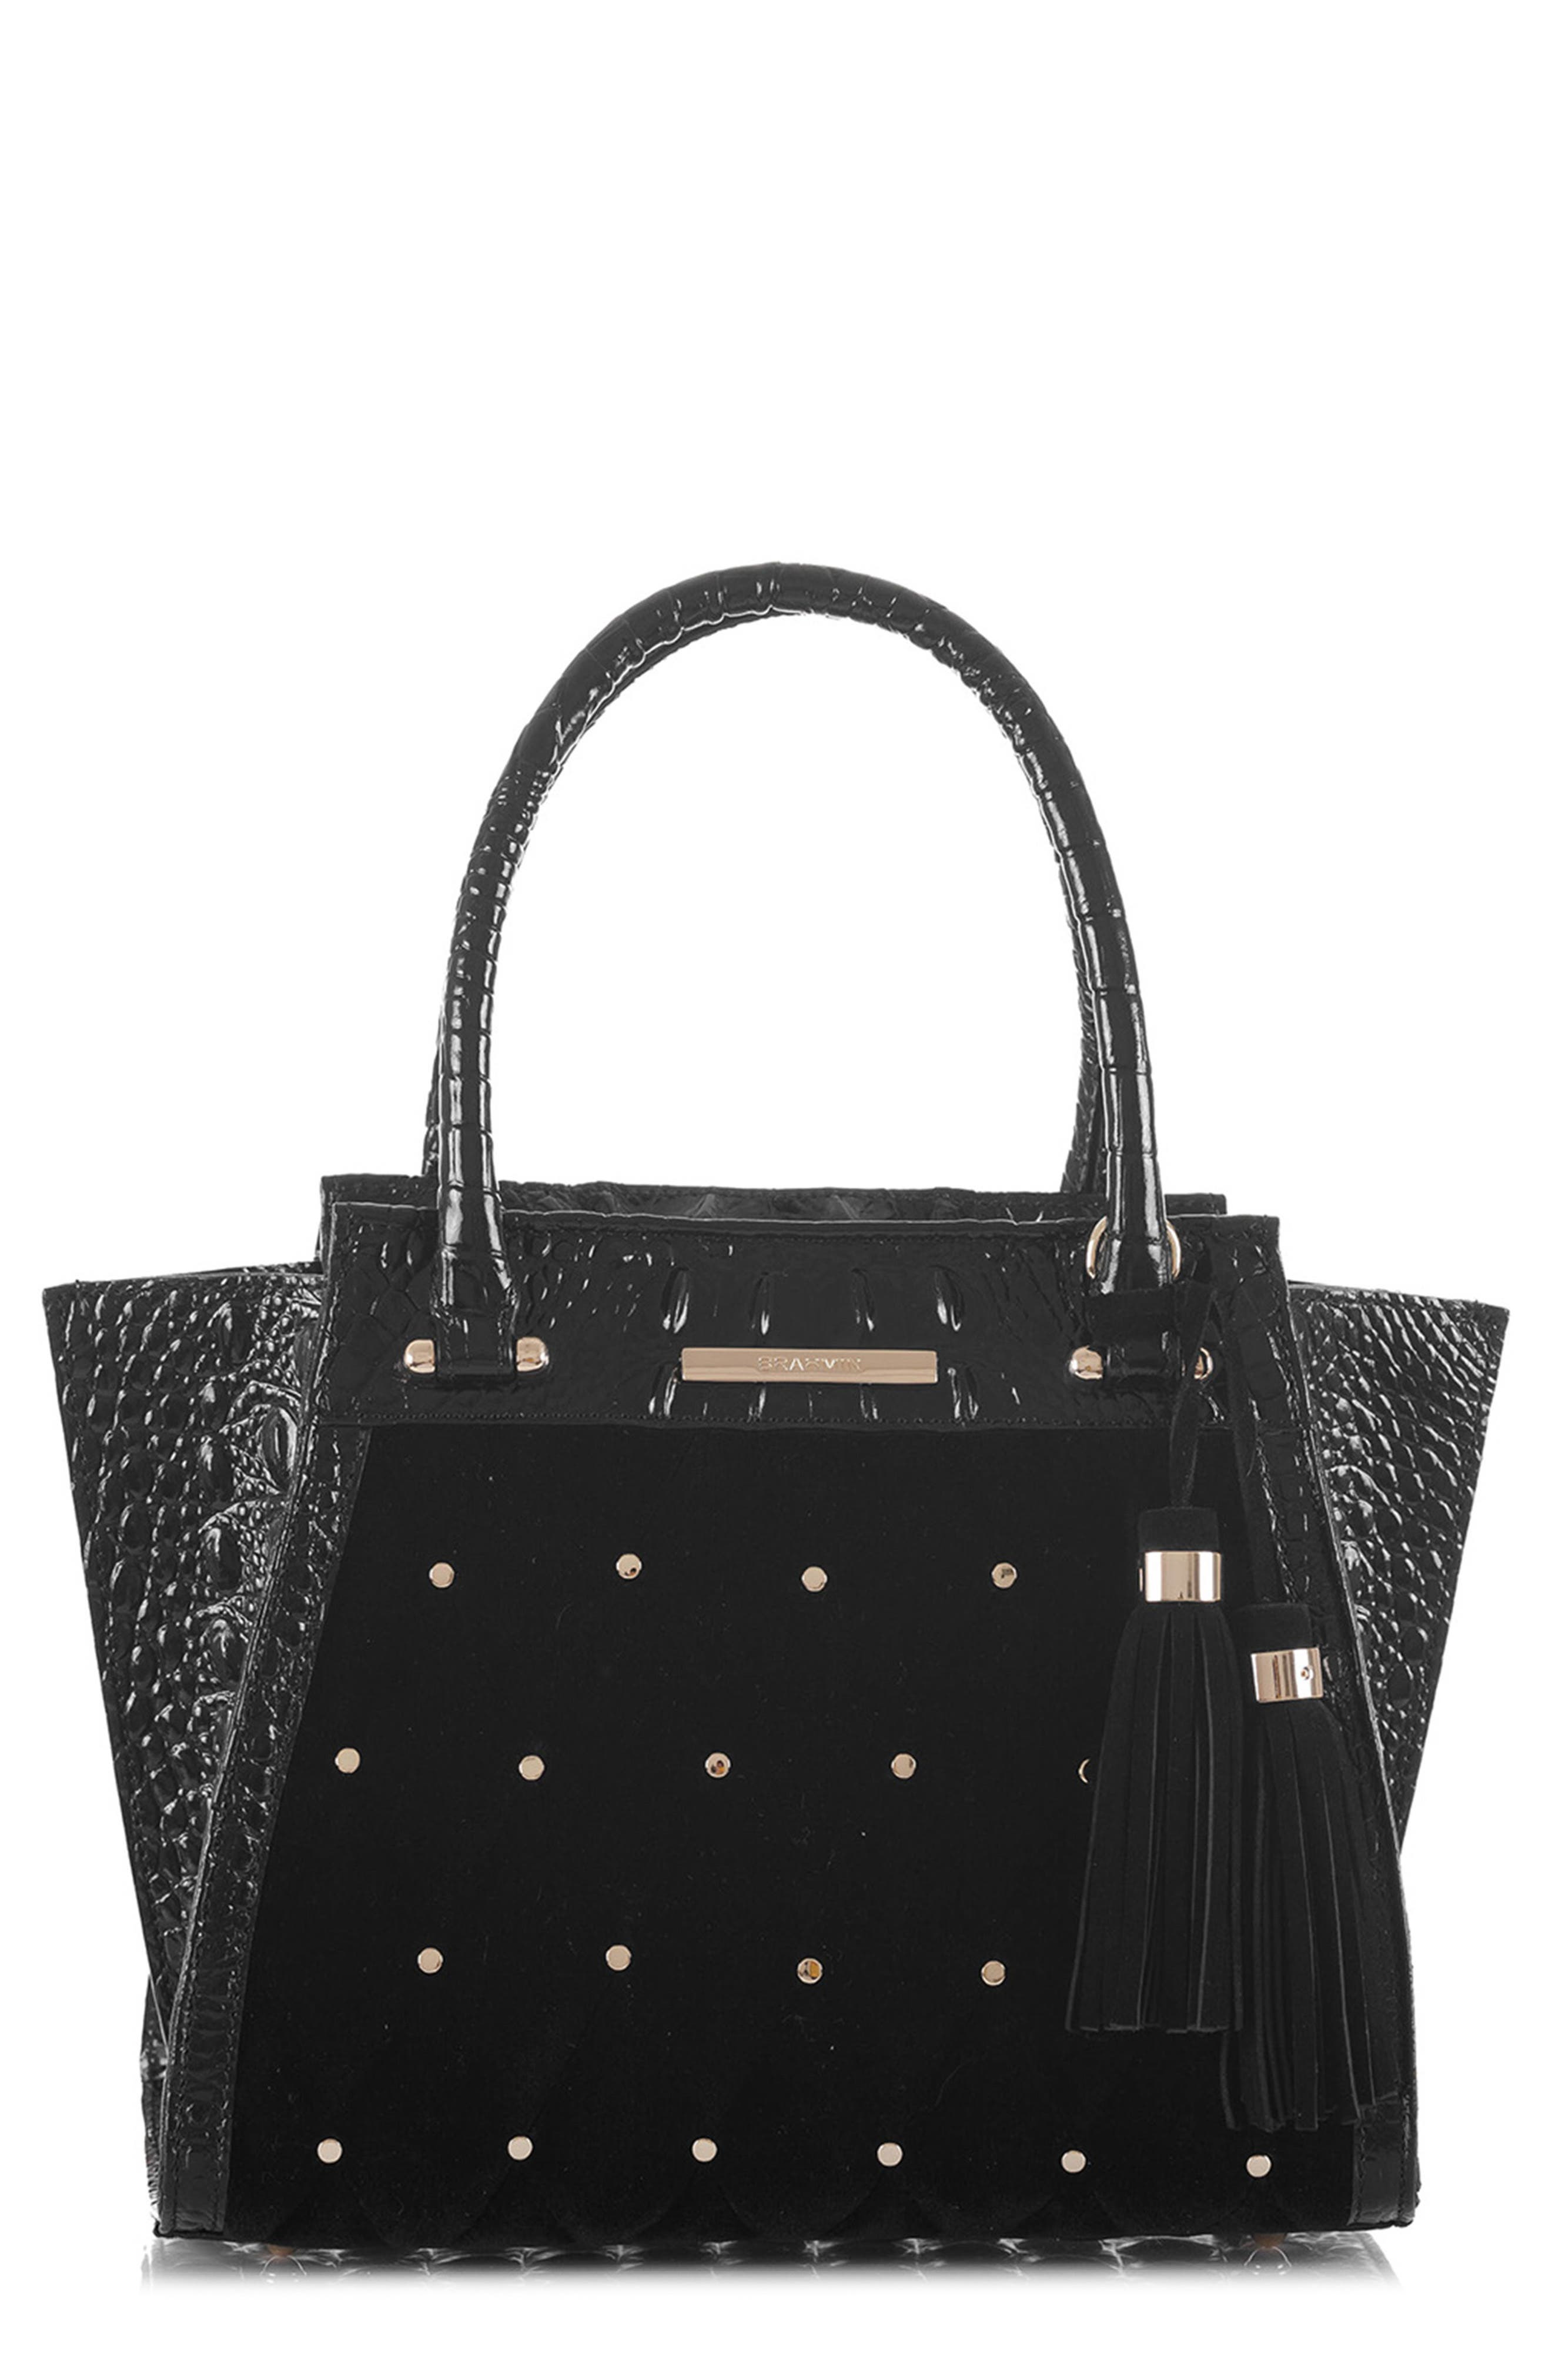 BRAHMIN, Mini Priscilla Studded Suede & Leather Satchel, Main thumbnail 1, color, BLACK